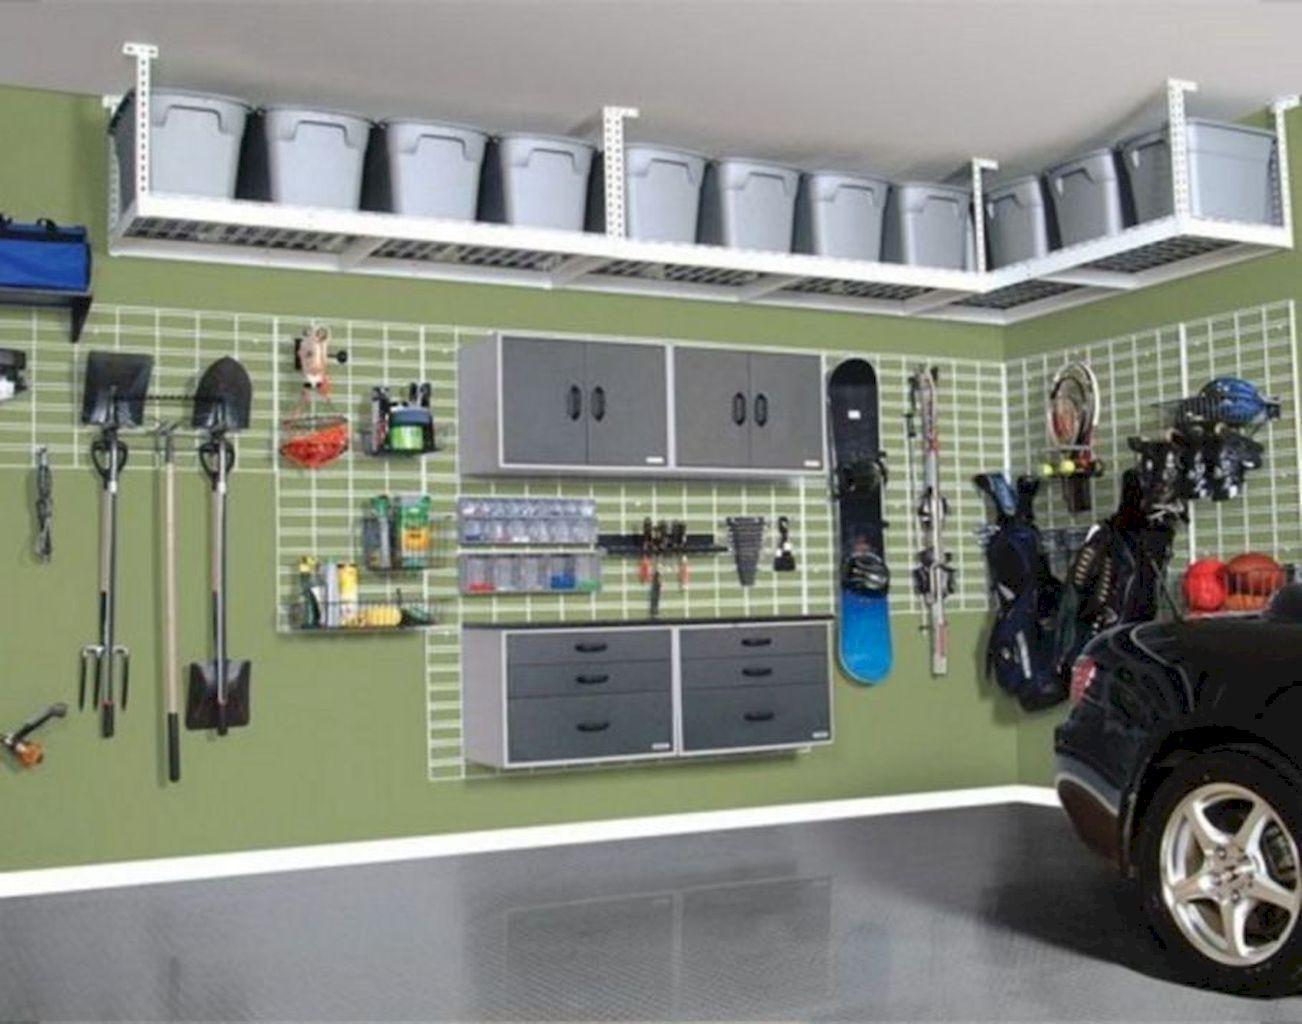 adorable 45 clever garage organization ideas https on clever garage organization ideas id=21621